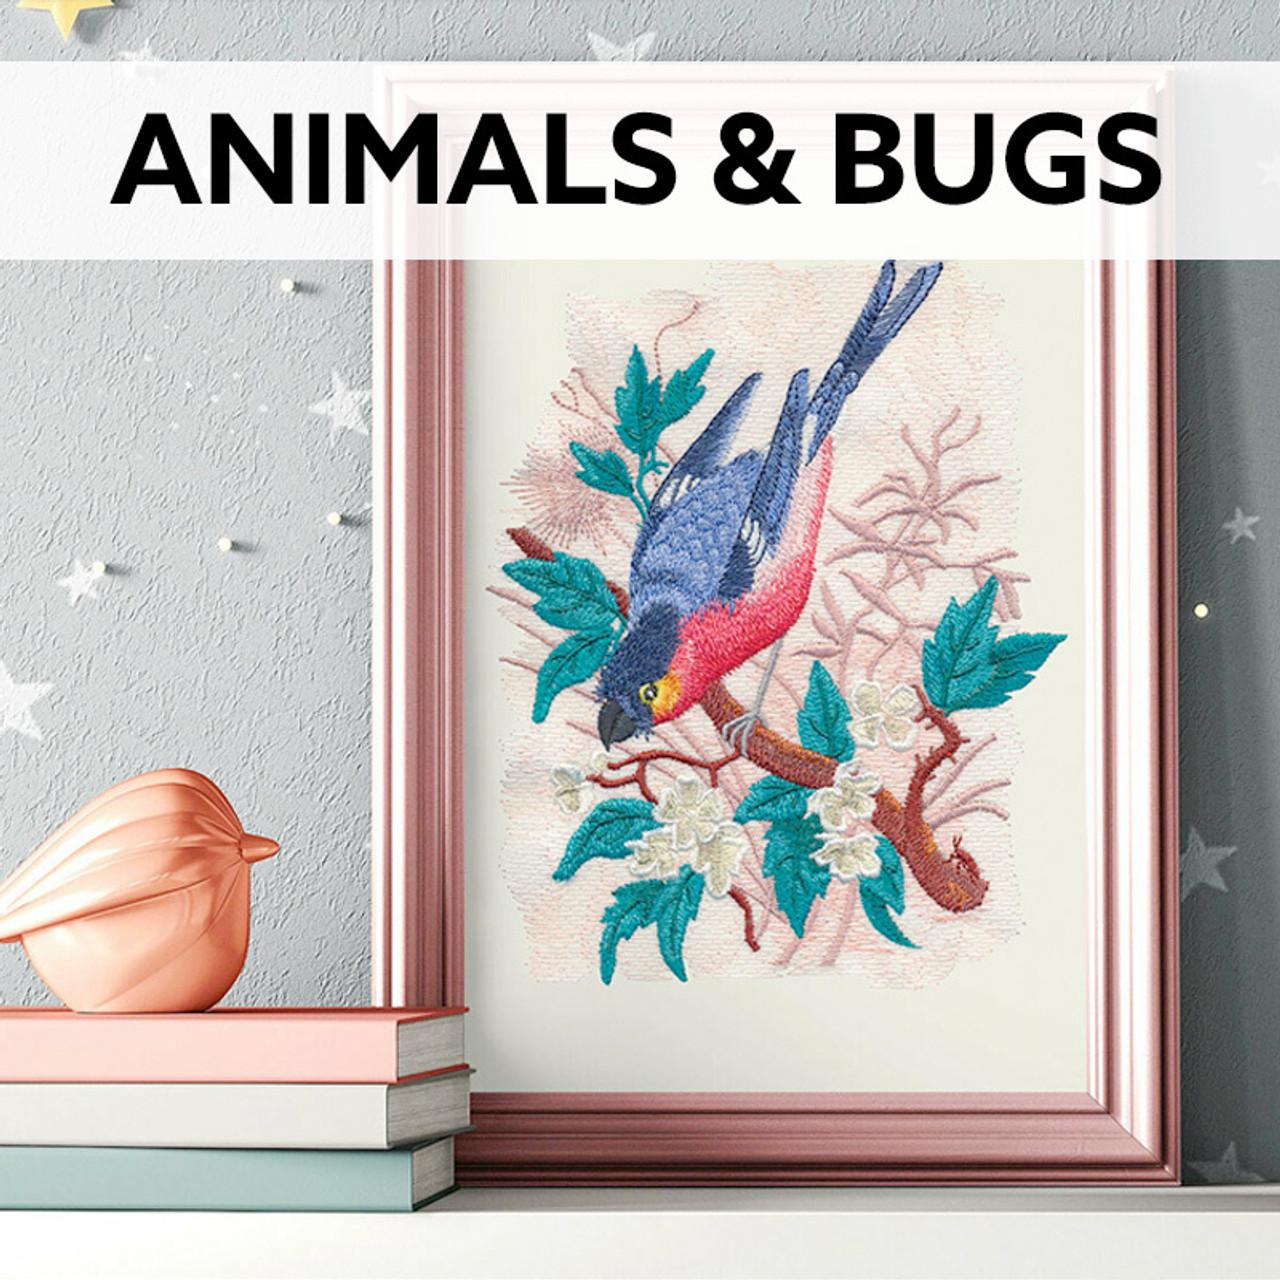 Animals & Bugs